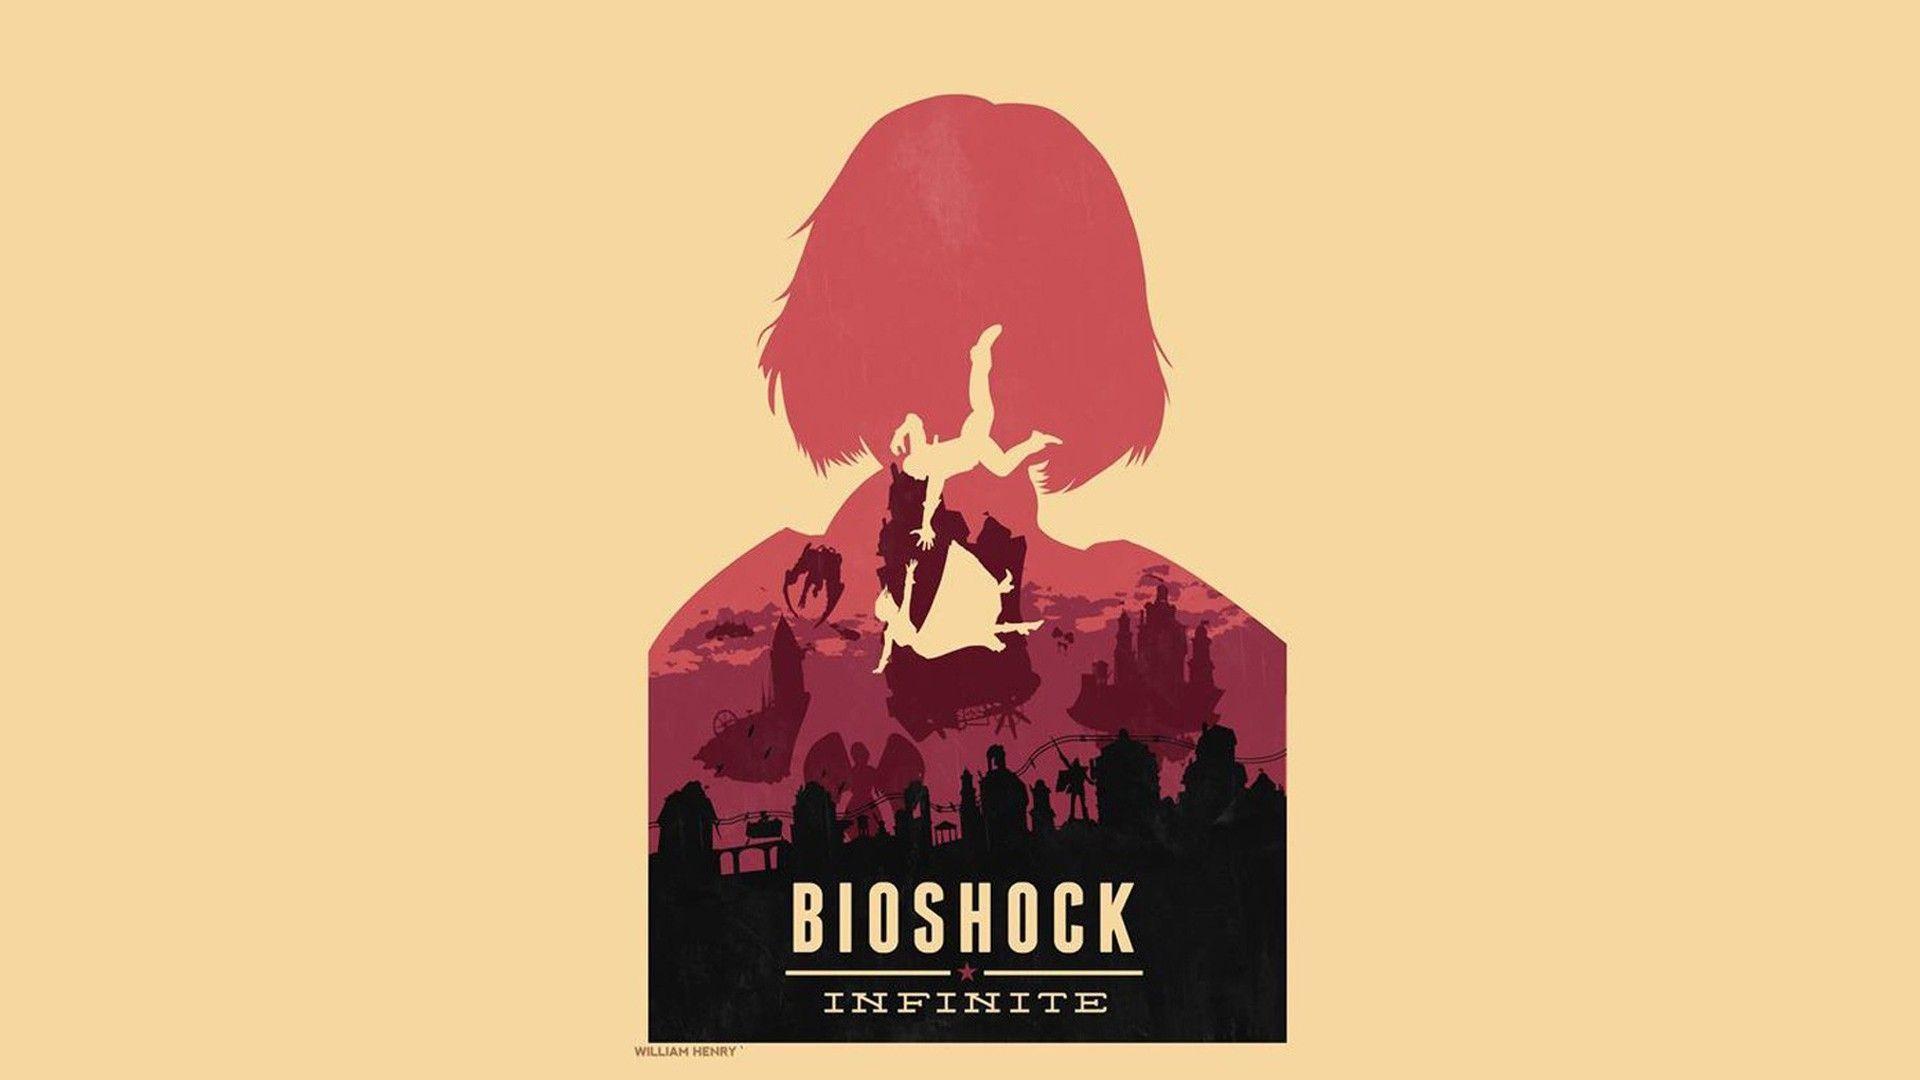 BioShock Infinite Wallpapers – Wallpaper Cave